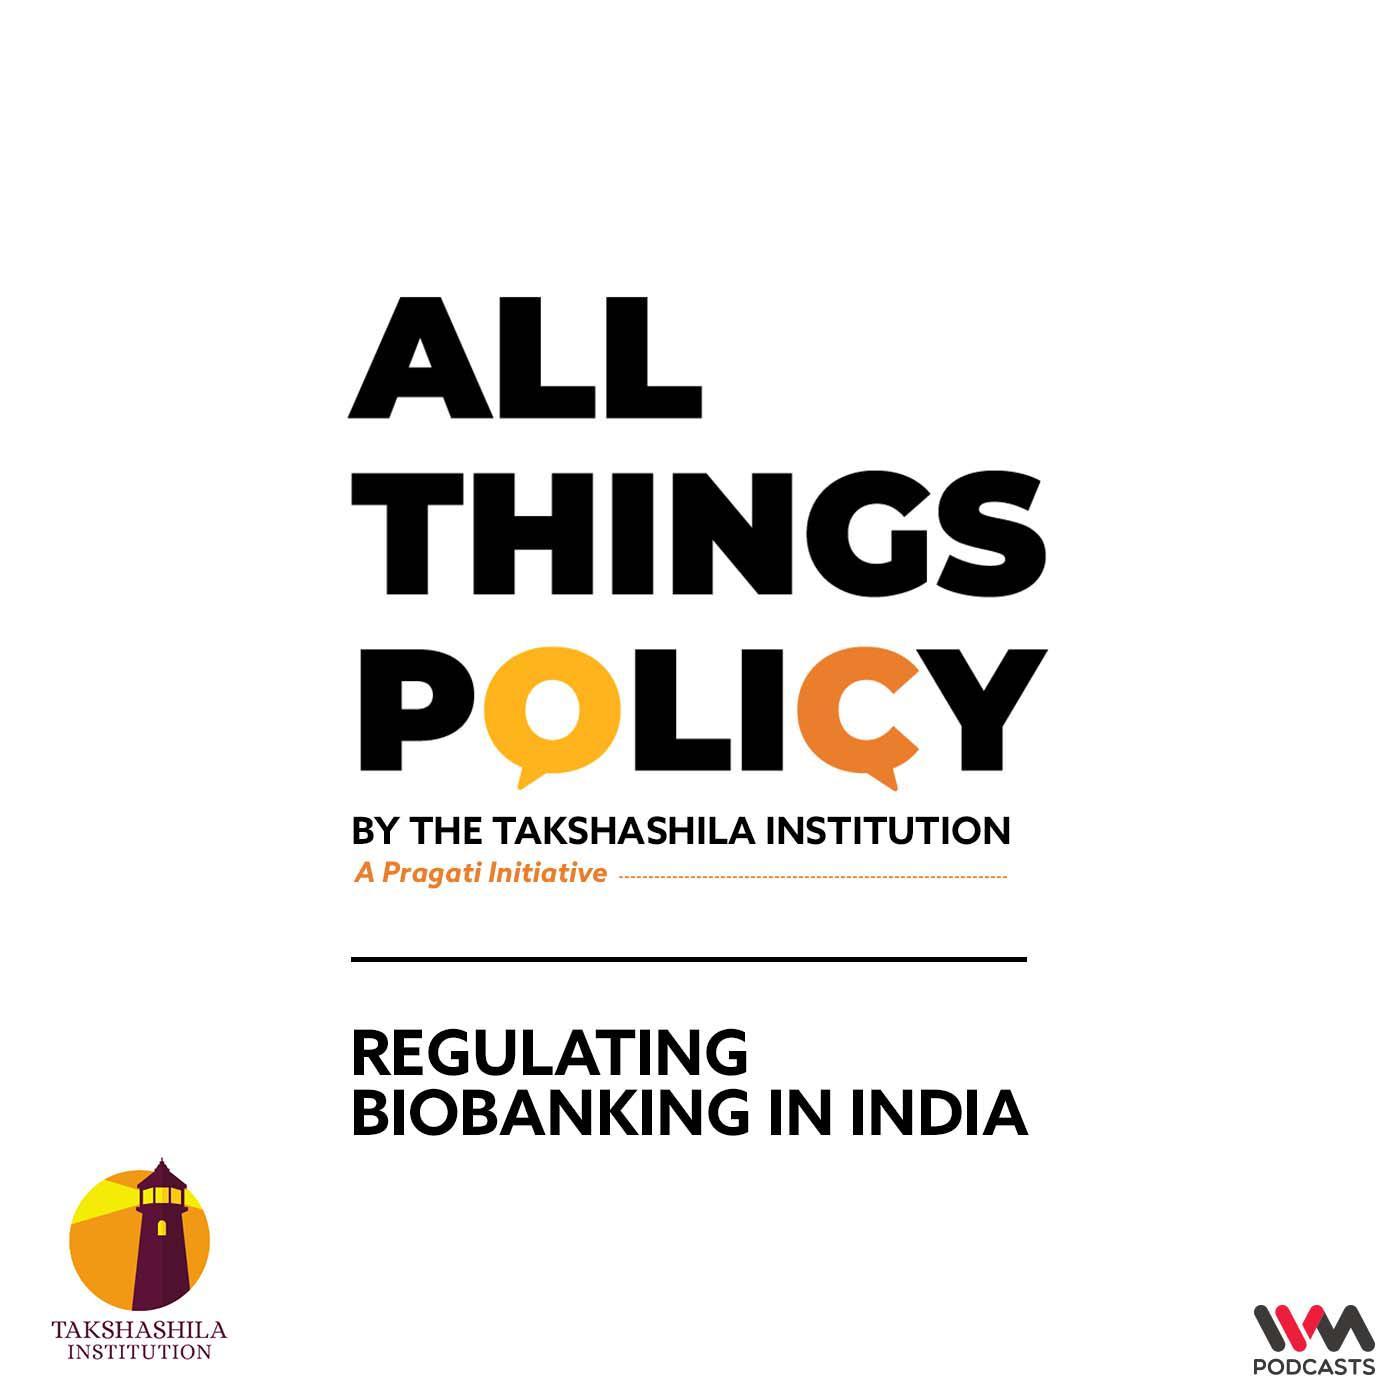 Regulating Biobanking in India